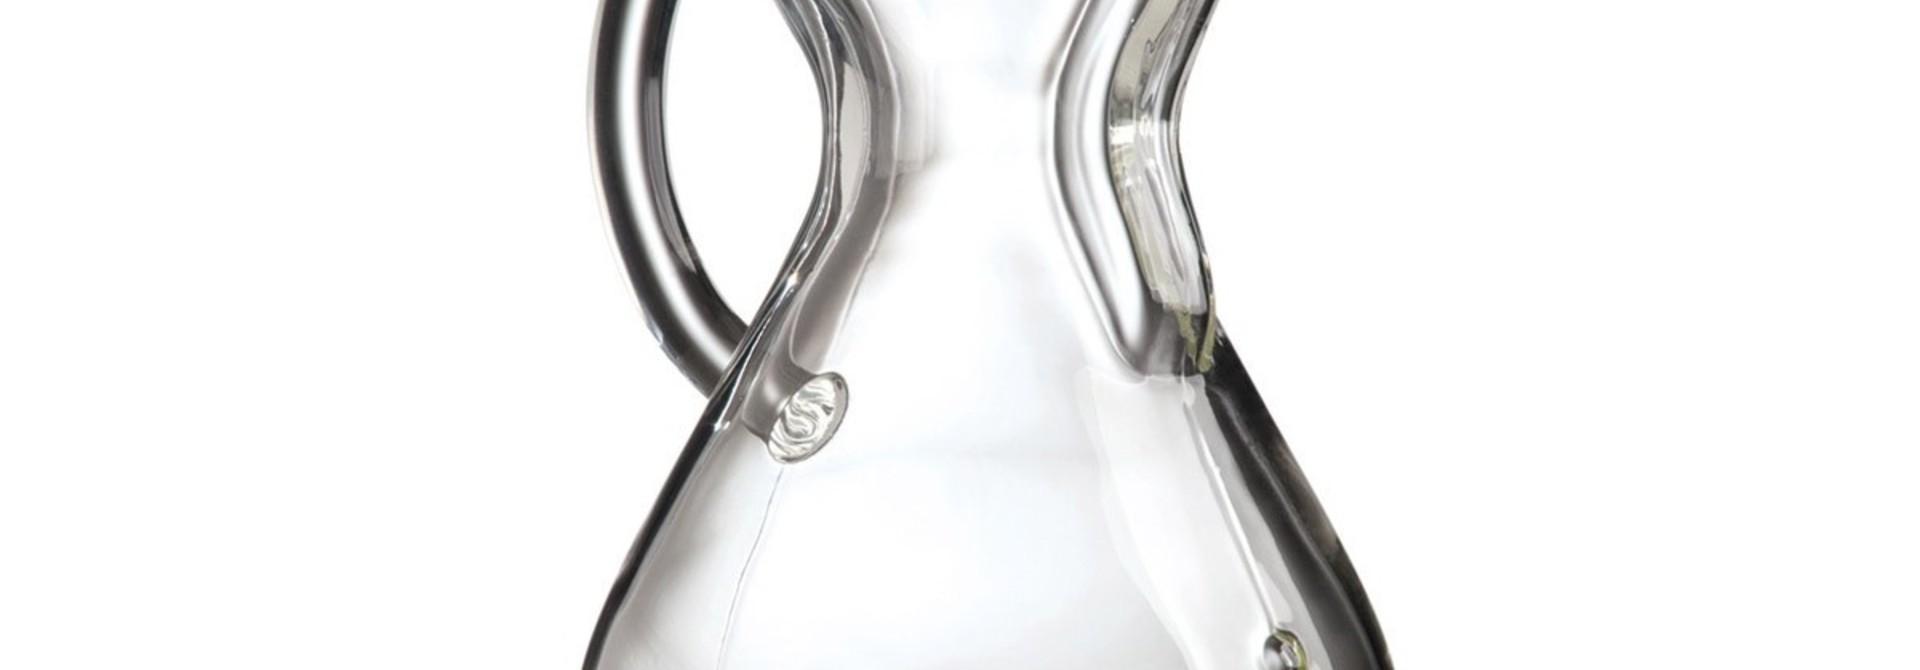 Chemex Glasshandle (6 cup)